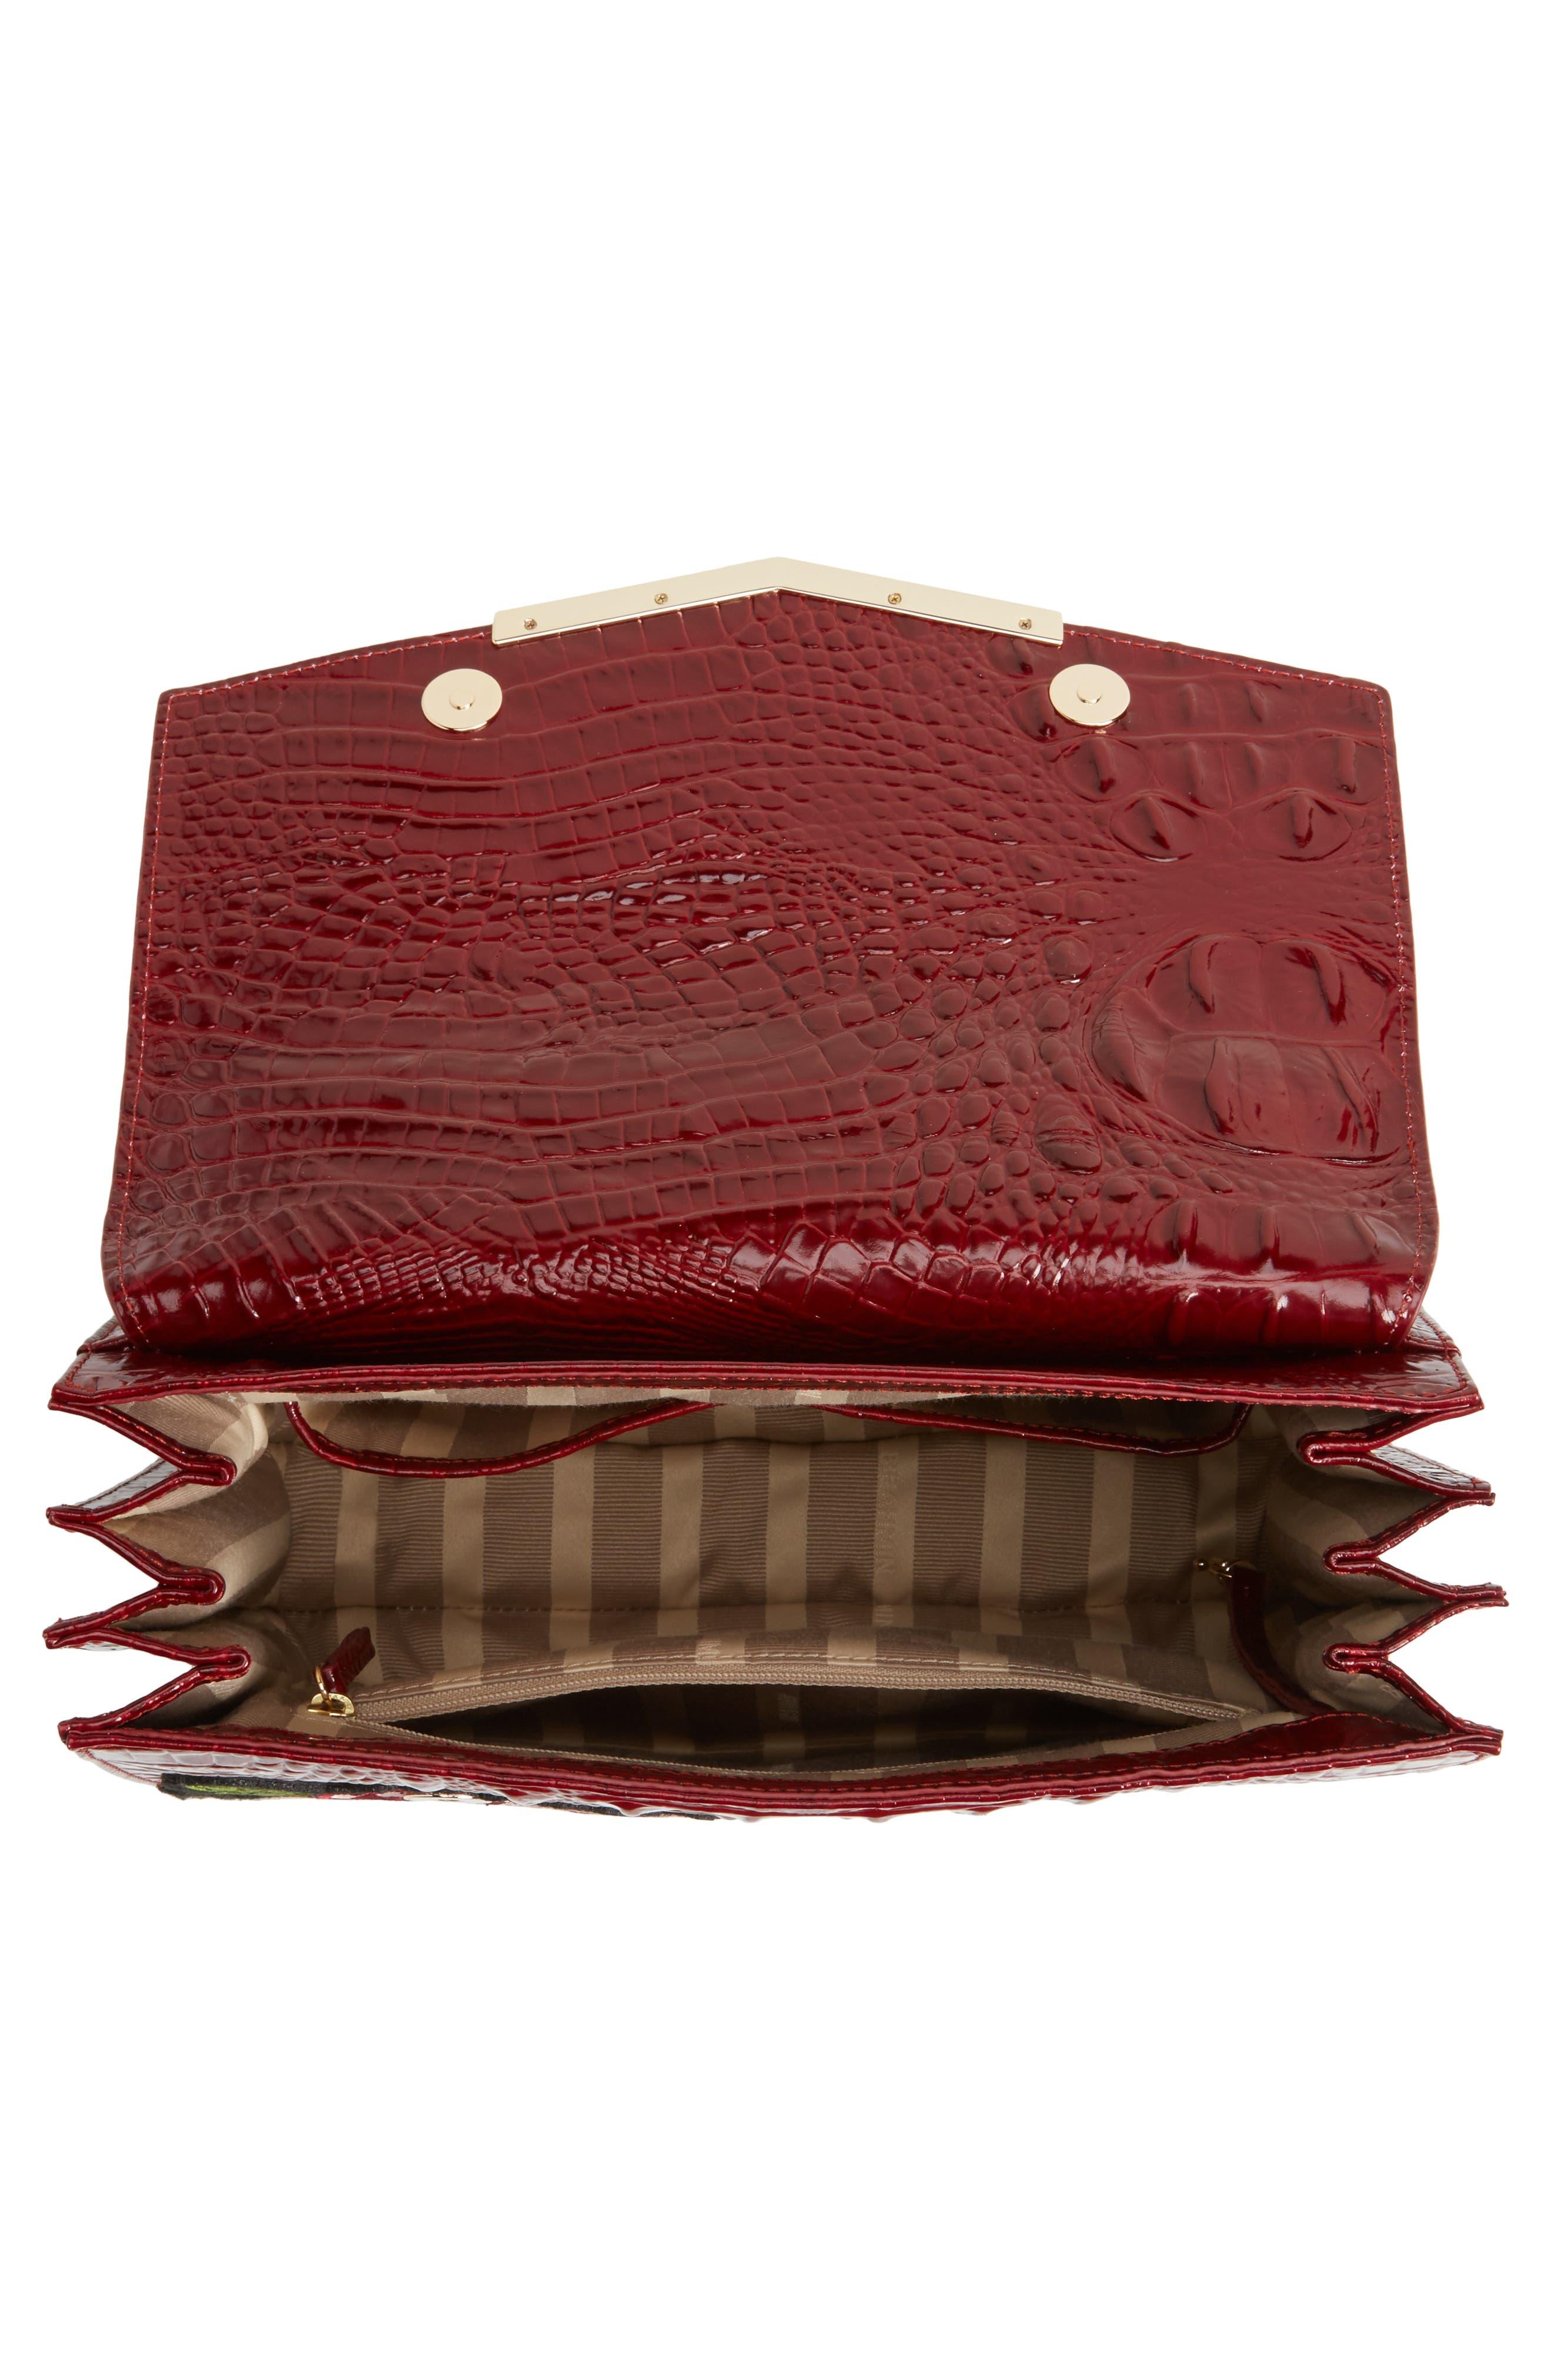 Chianti Rossini - Gabriella Leather Top Handle Satchel,                             Alternate thumbnail 4, color,                             644